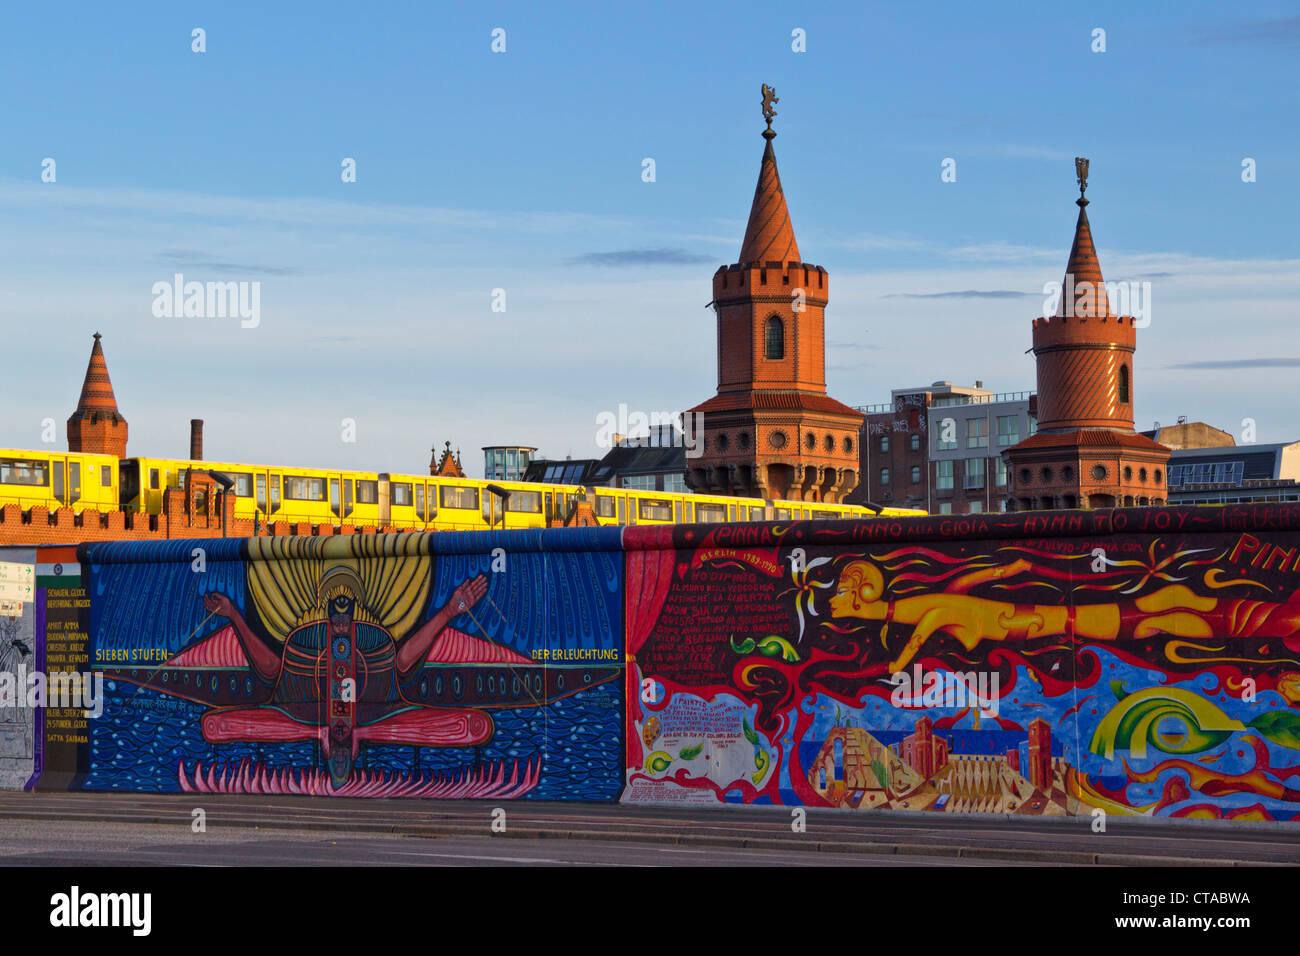 Berliner Mauer-Wandbild, East Side Gallery, Berlin, Deutschland, Europa Stockbild